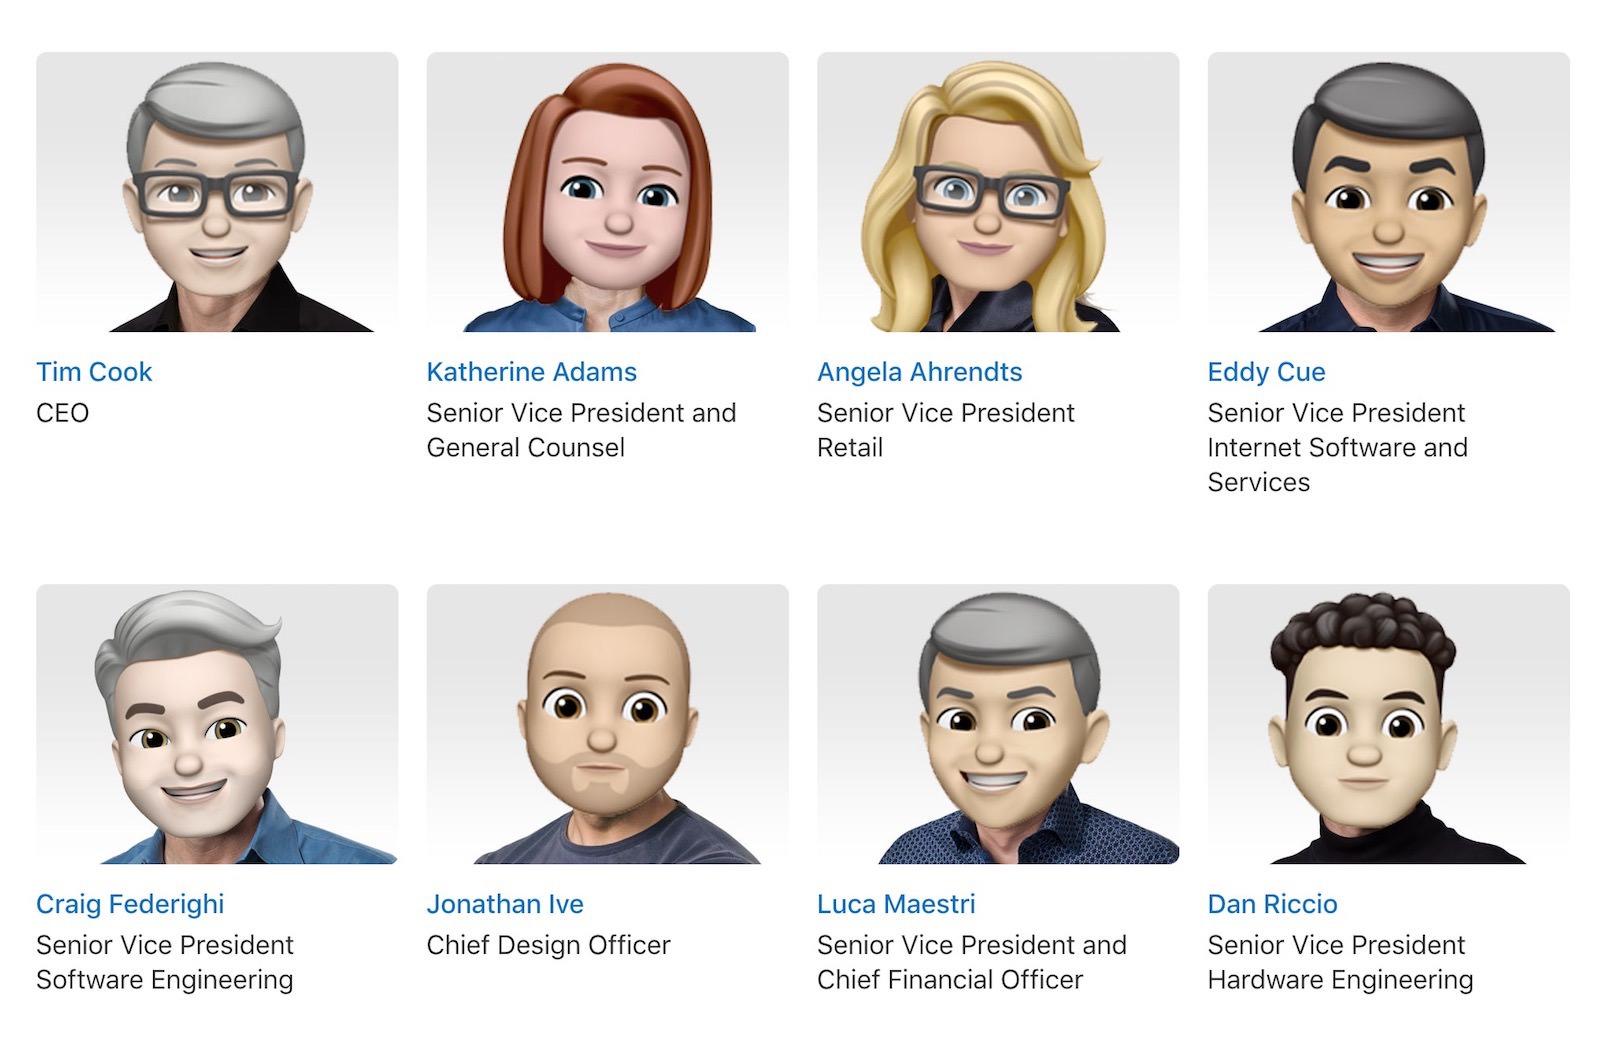 Executives-Profiles-in-Emoji-OGP